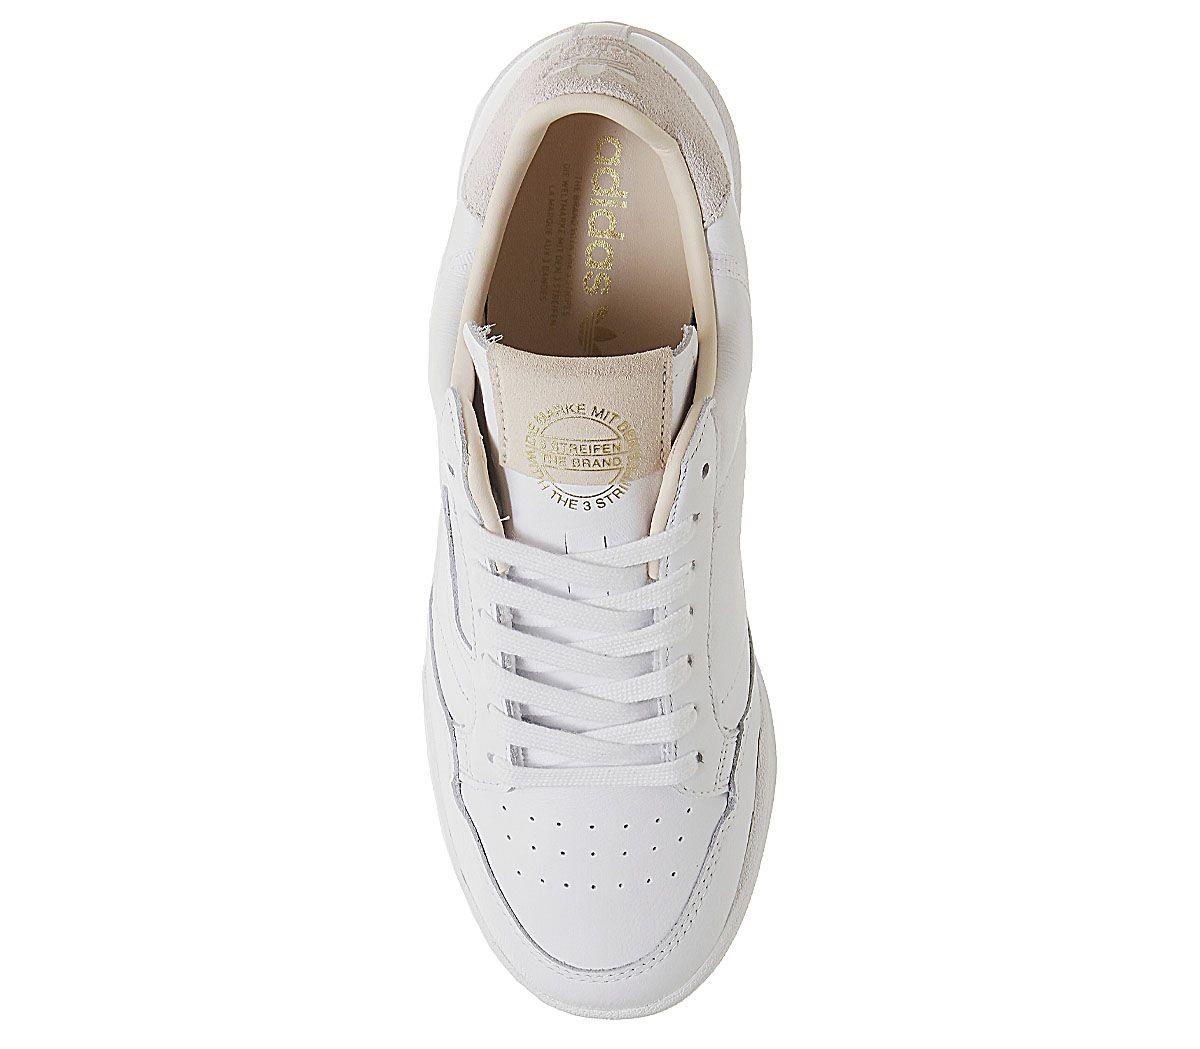 Adidas-Continental-80S-Scarpe-da-ginnastica-White-White-Scarpe-da-ginnastica-bianco-cristallo miniatura 5